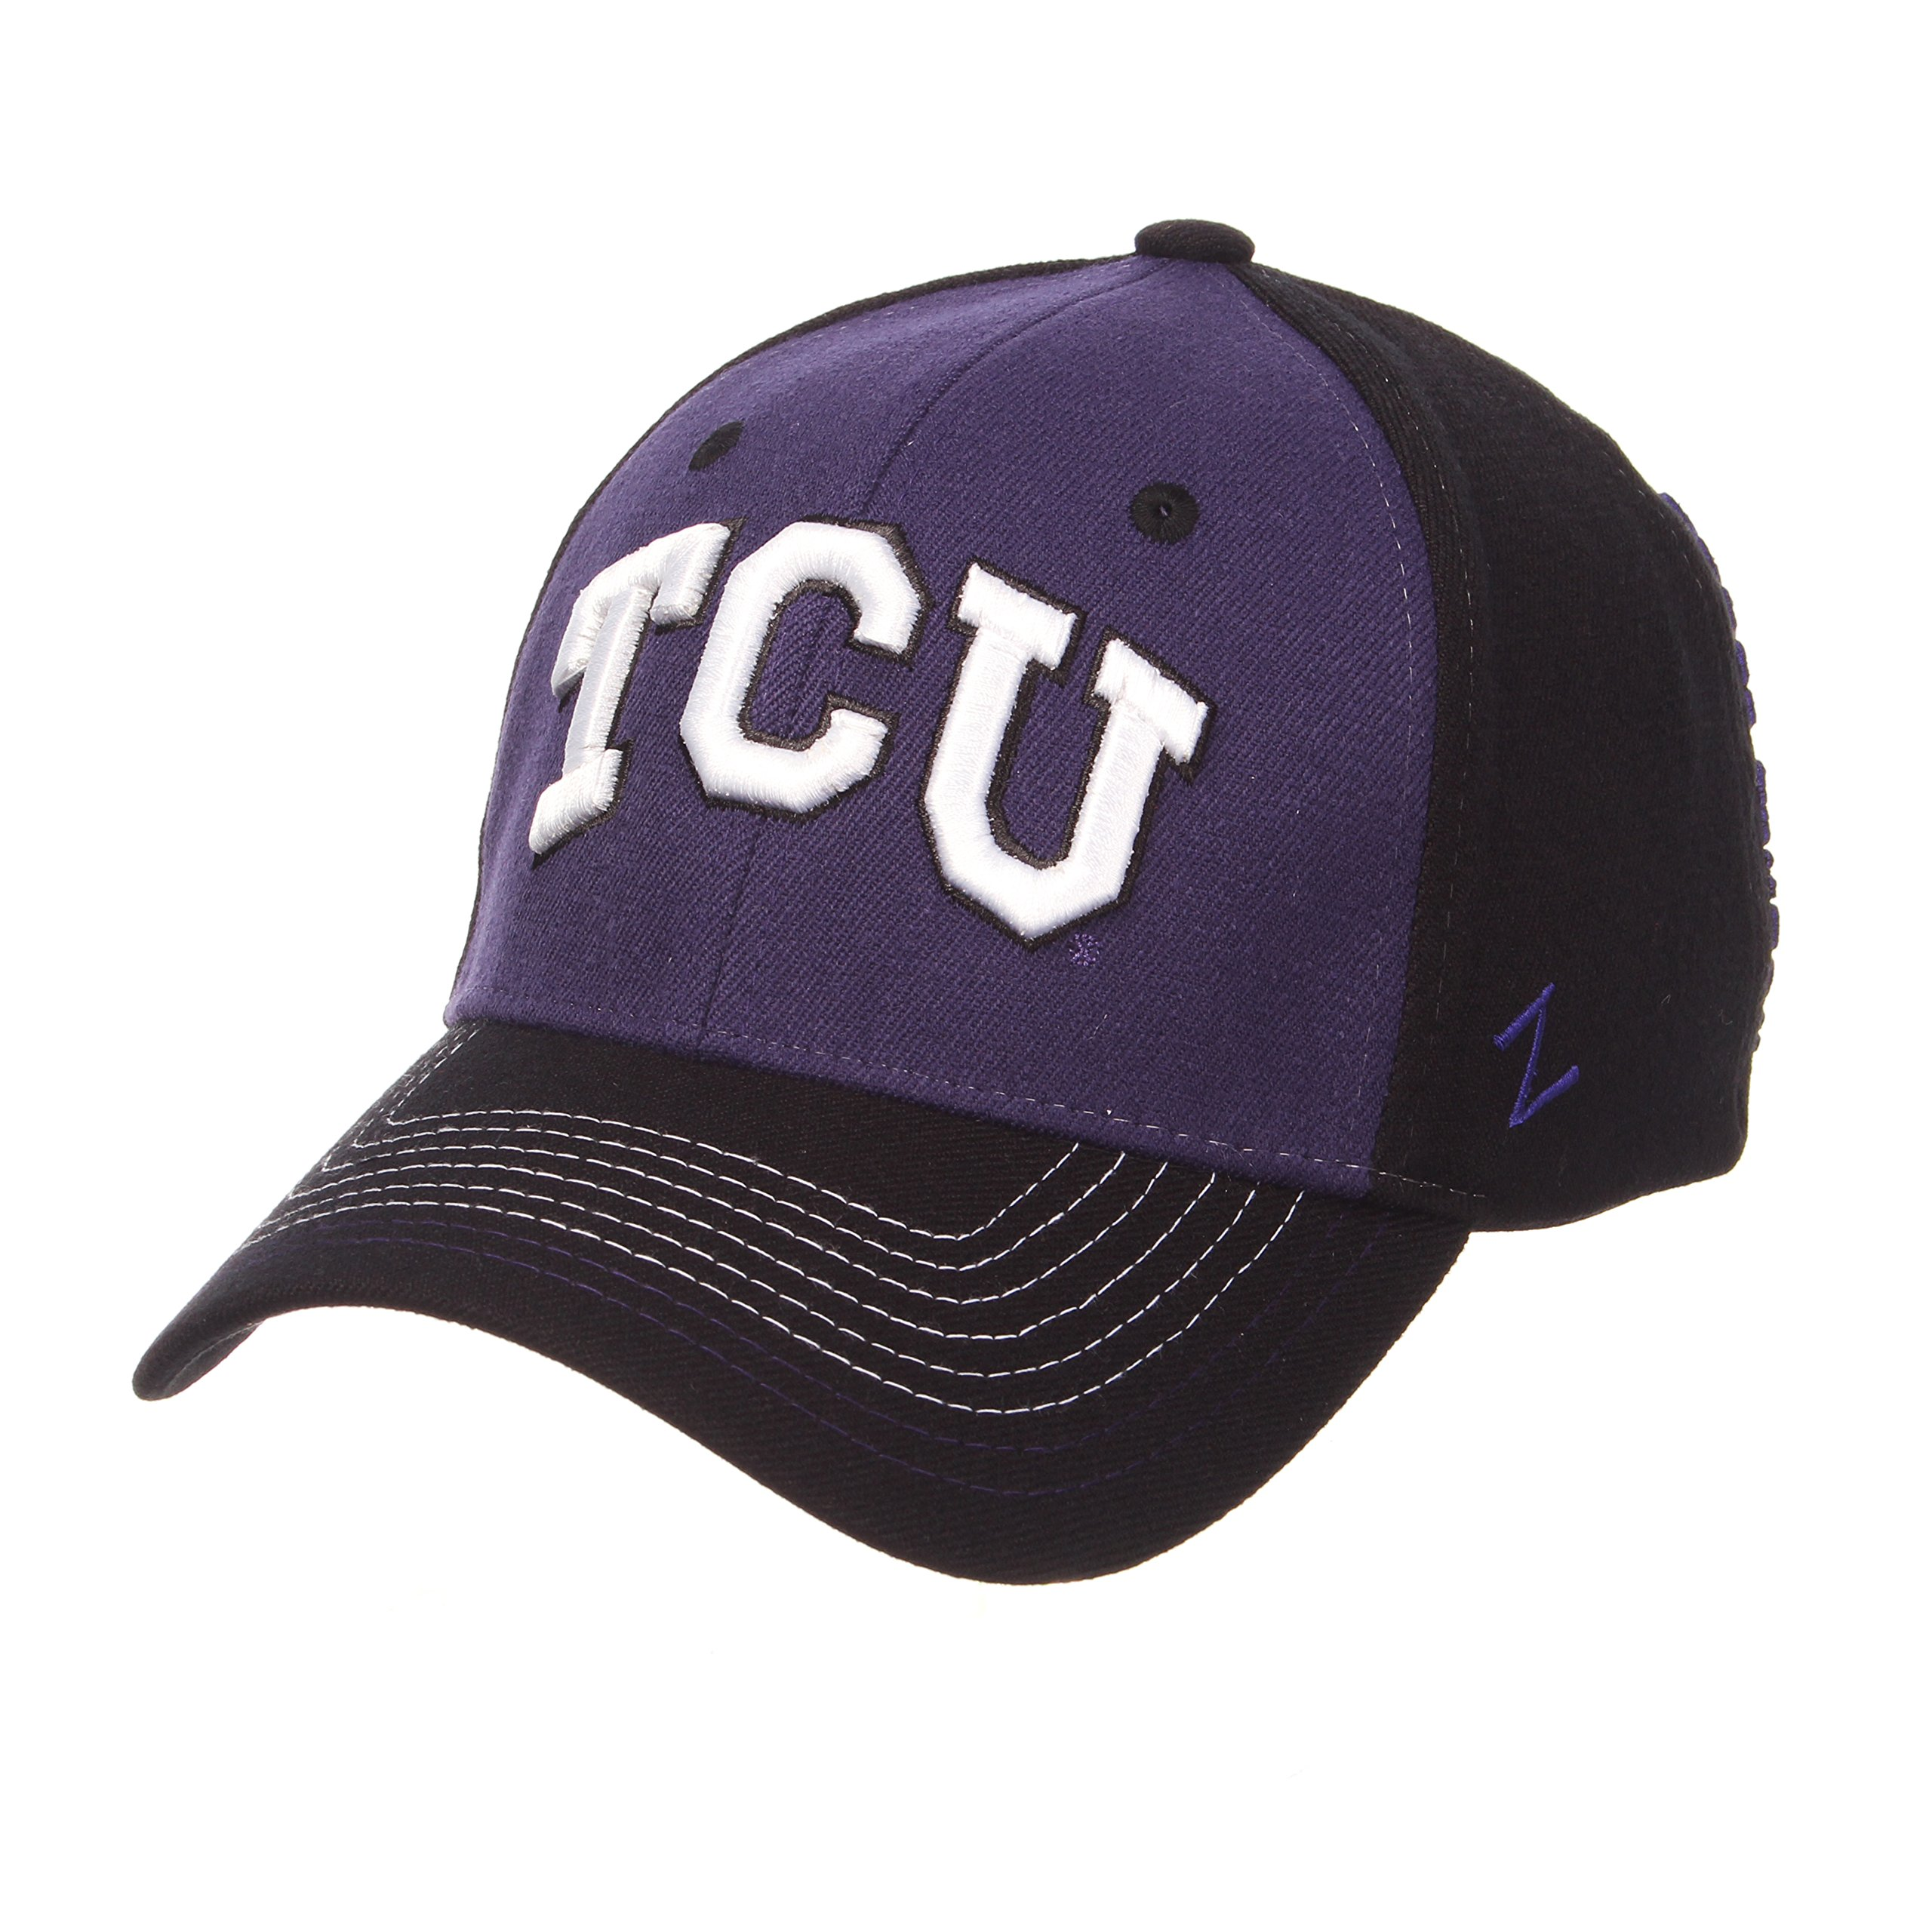 Zephyr NCAA Mens Stitch NCAA Hat